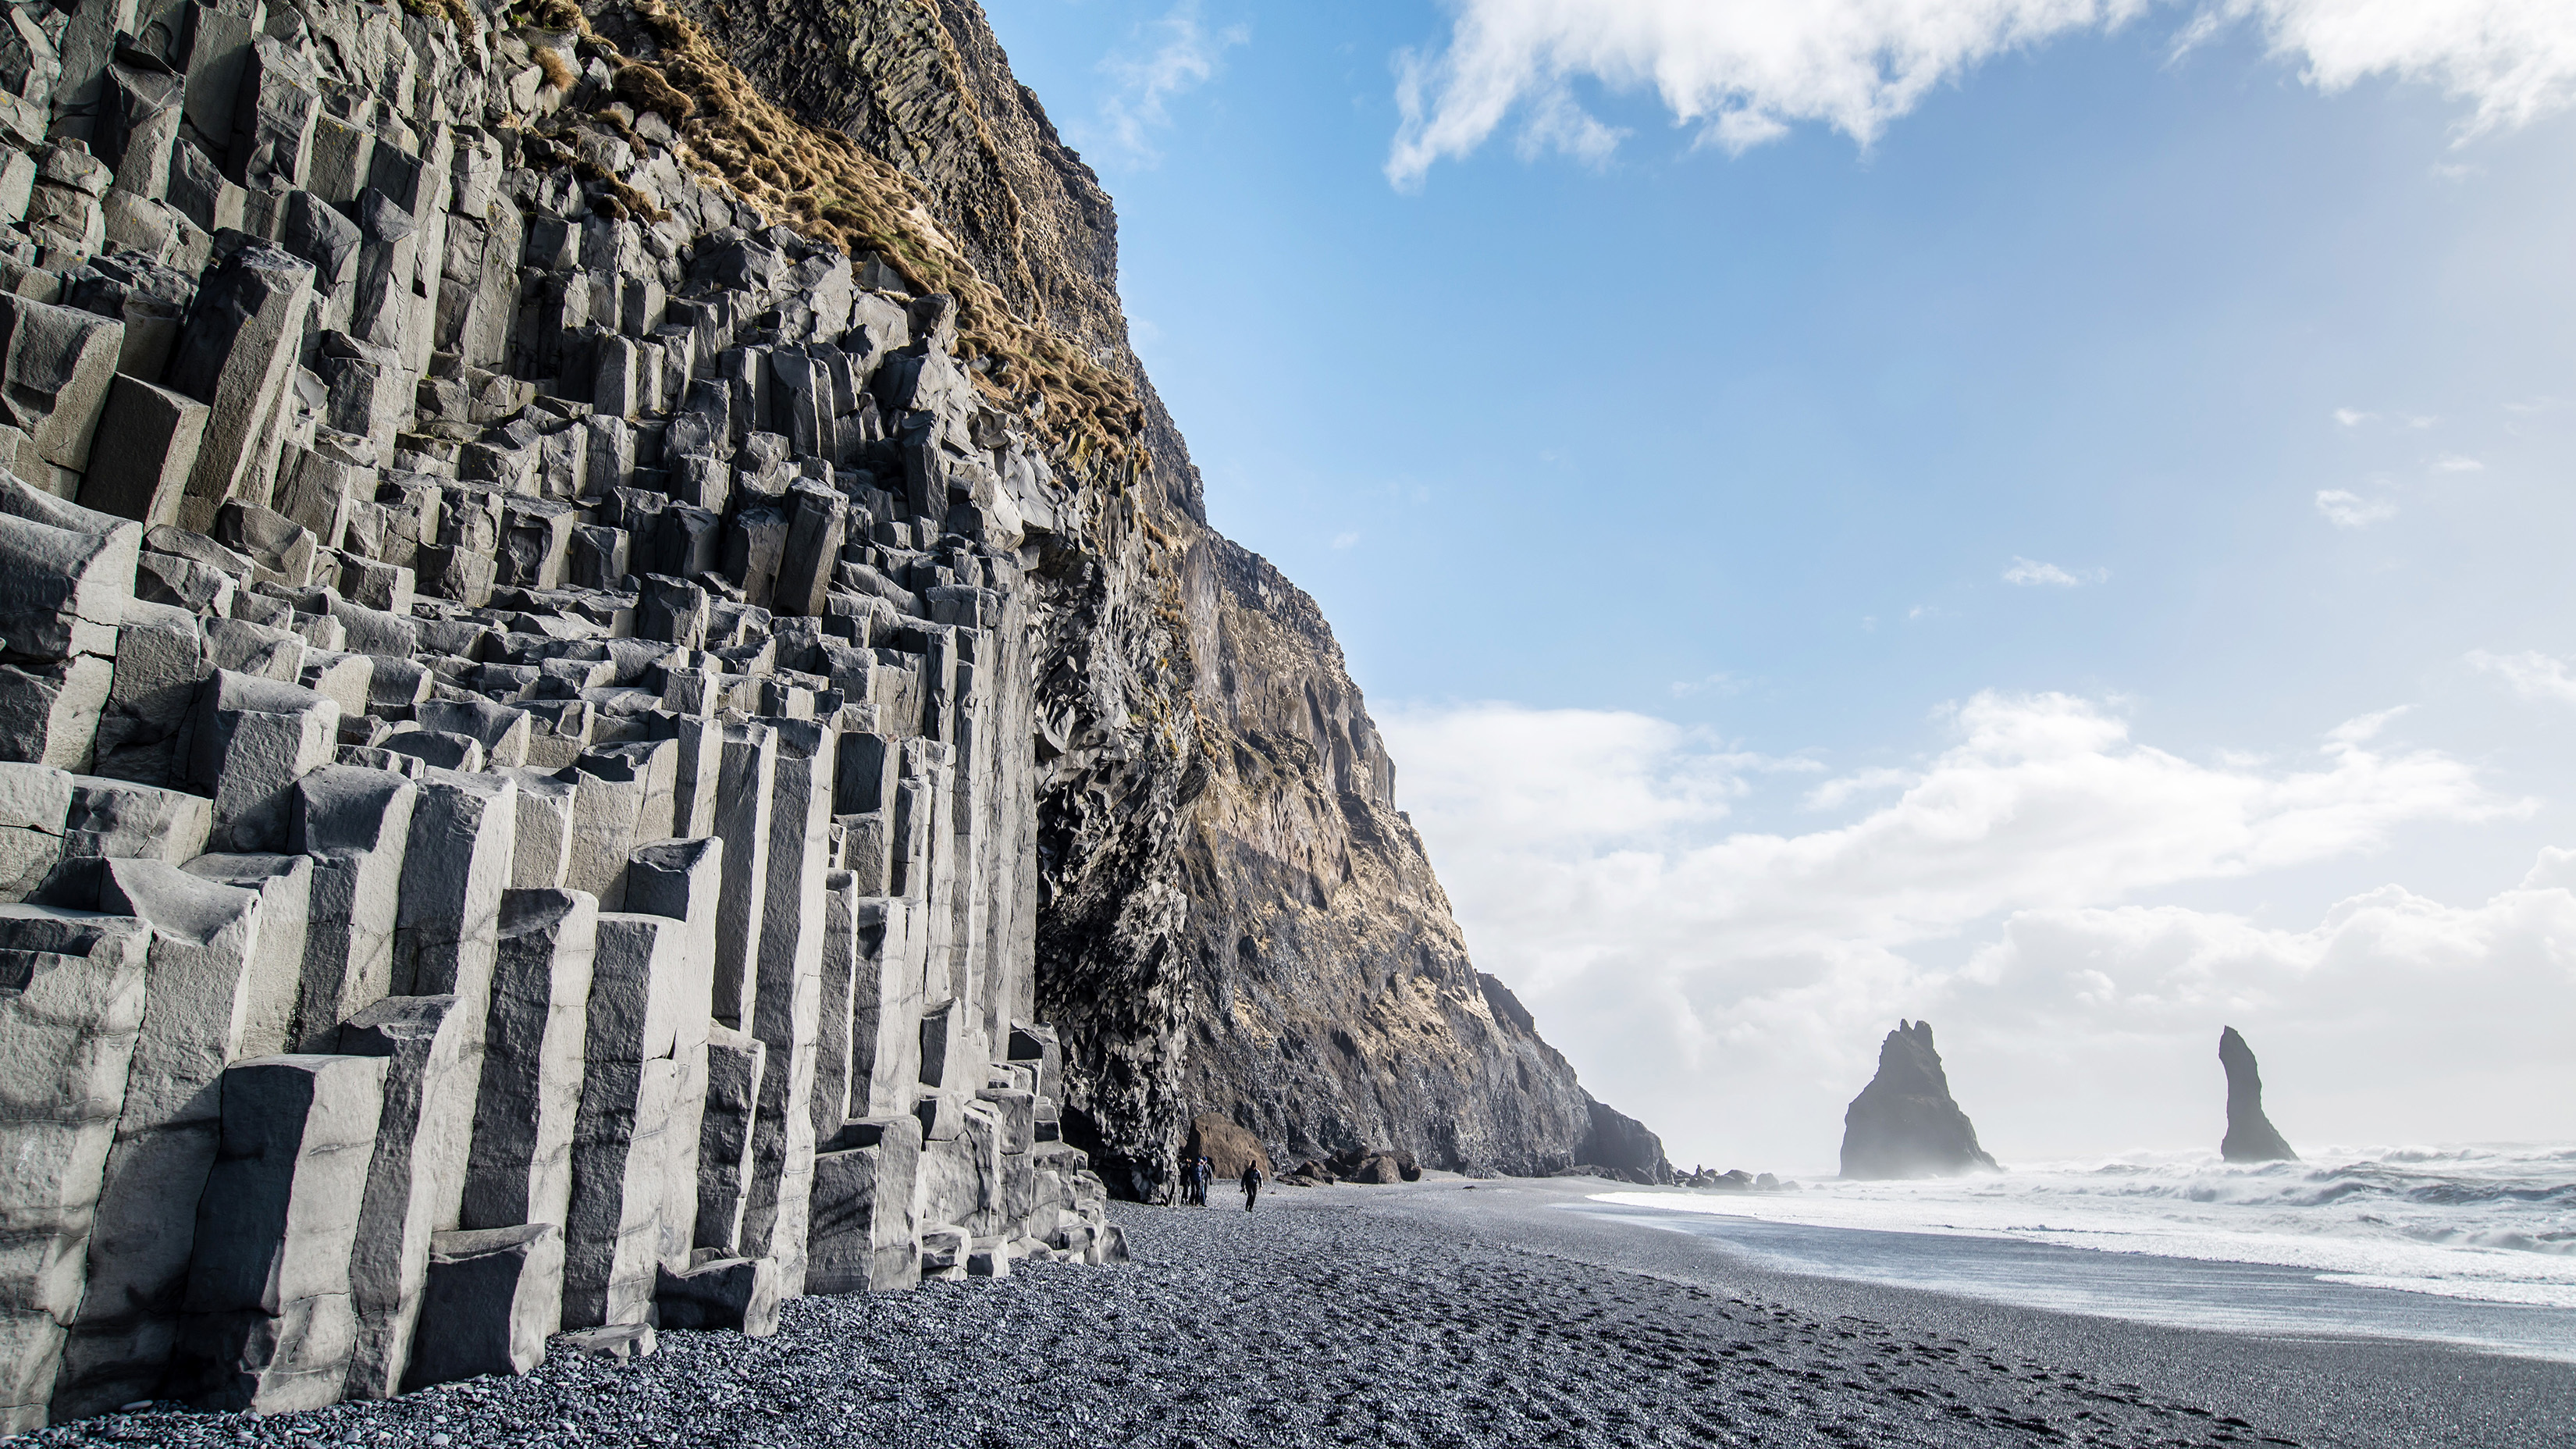 South Coast Minibus Tour with Glacier Hike & Transfer from Reykjavik